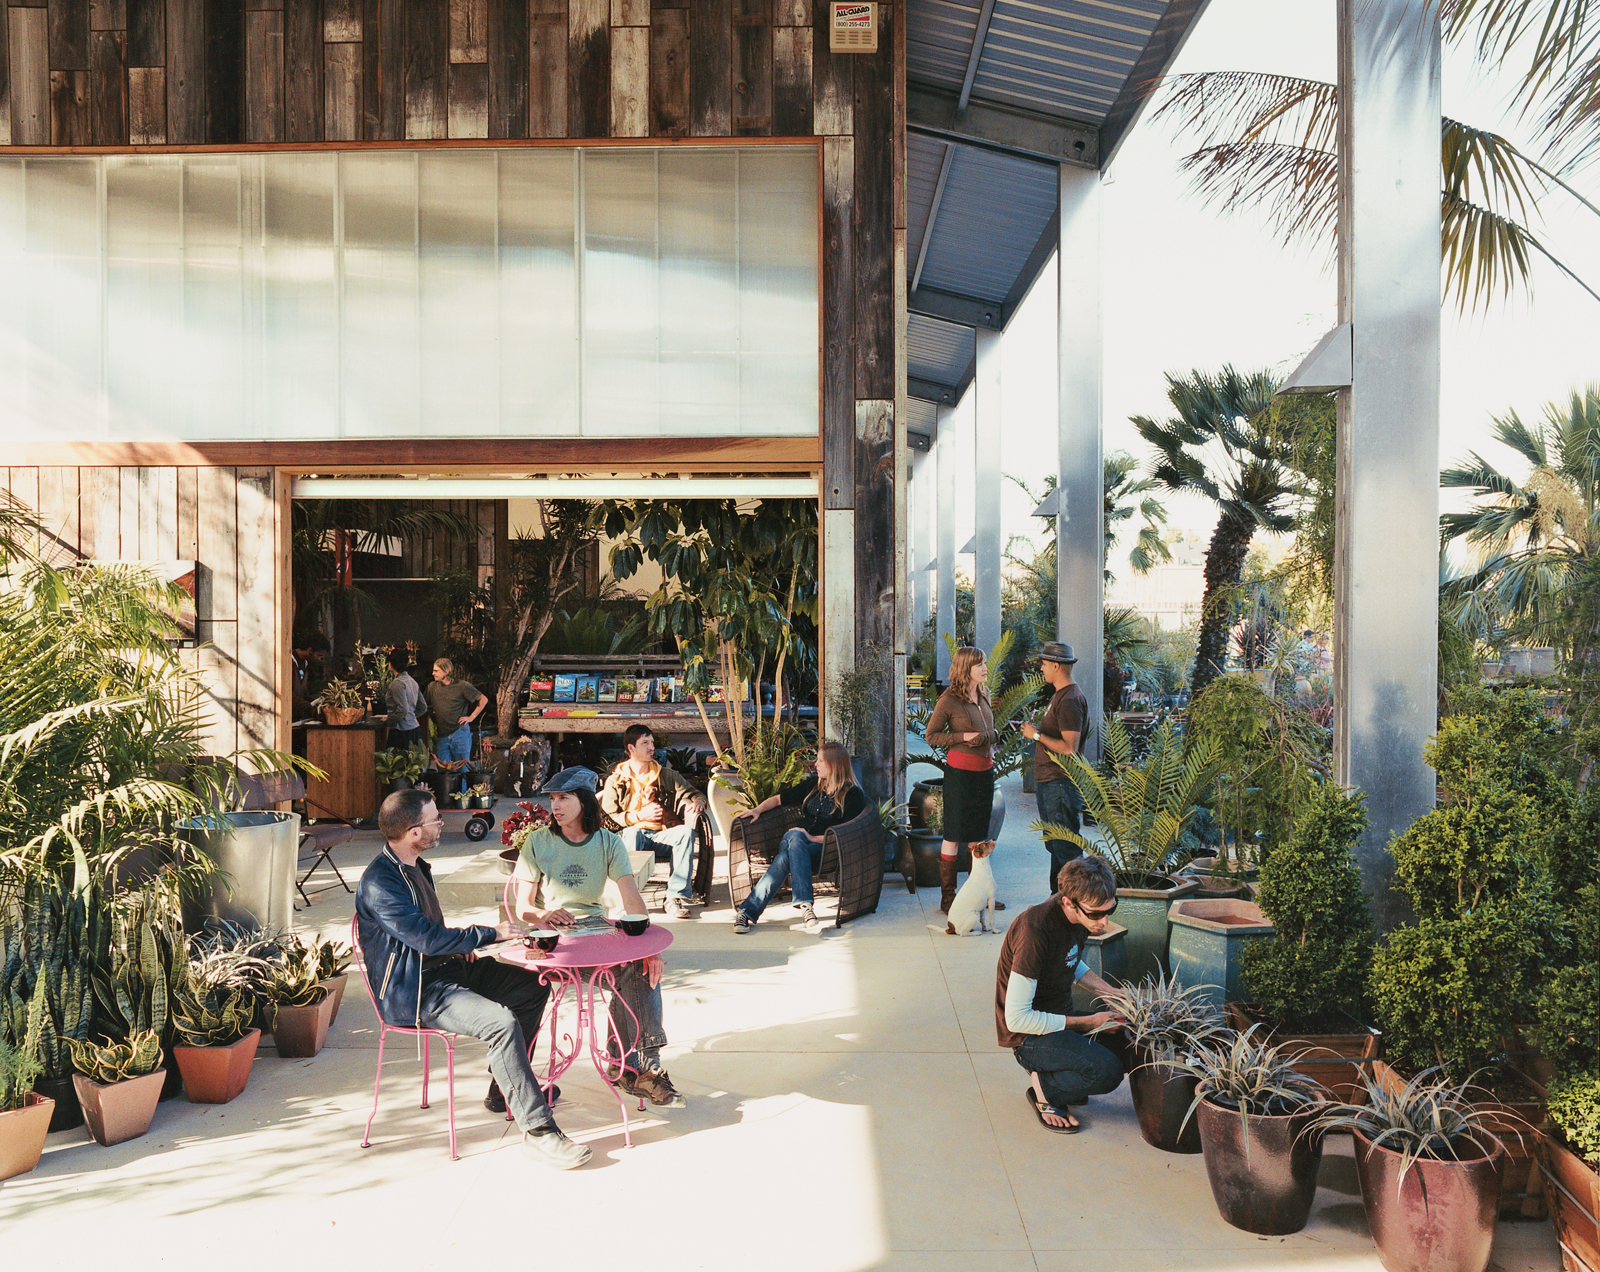 Flora Grubb Gardens is an open-air gardening center offers unique plants, garden decor and an espresso bar.